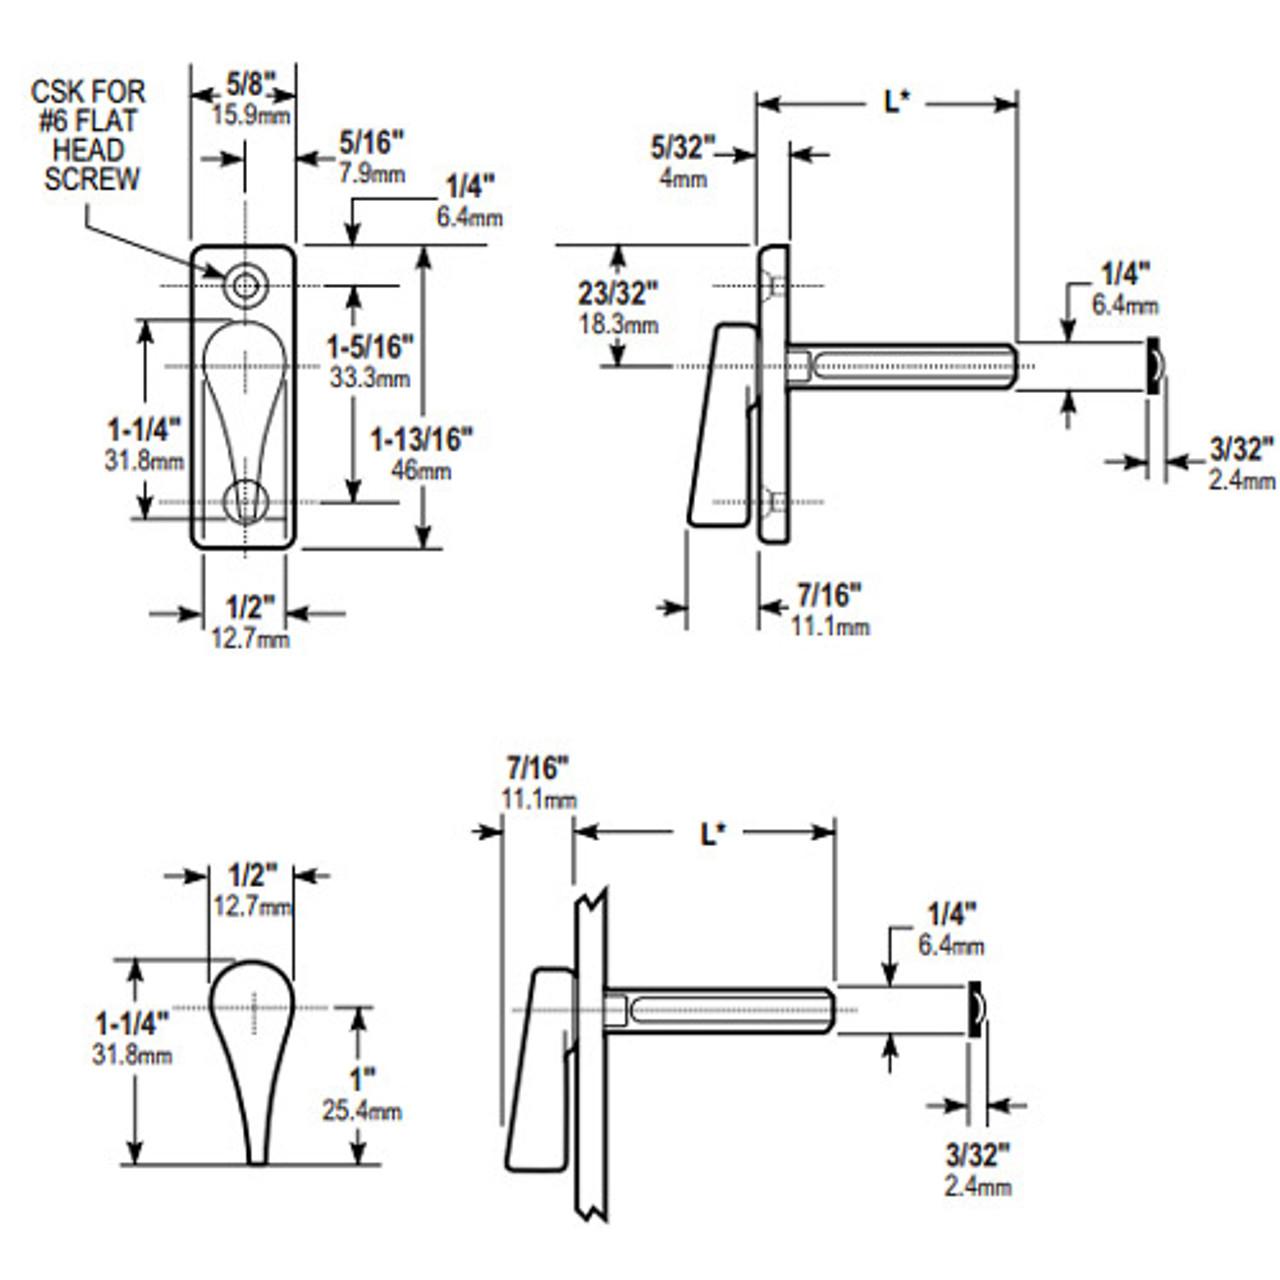 1000-21-15-119 Adams Rite 1000 Series Turns Dimensional View